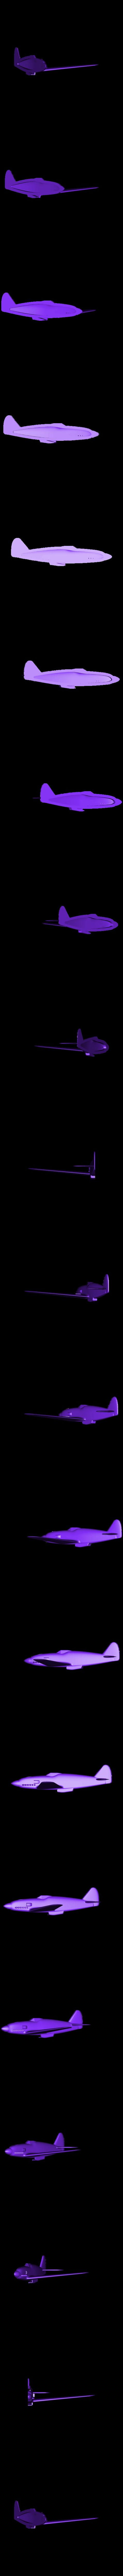 KI61_right_HD.STL Download STL file Kawasaki Ki-61 Hien • 3D printing template, 3Dmodeling